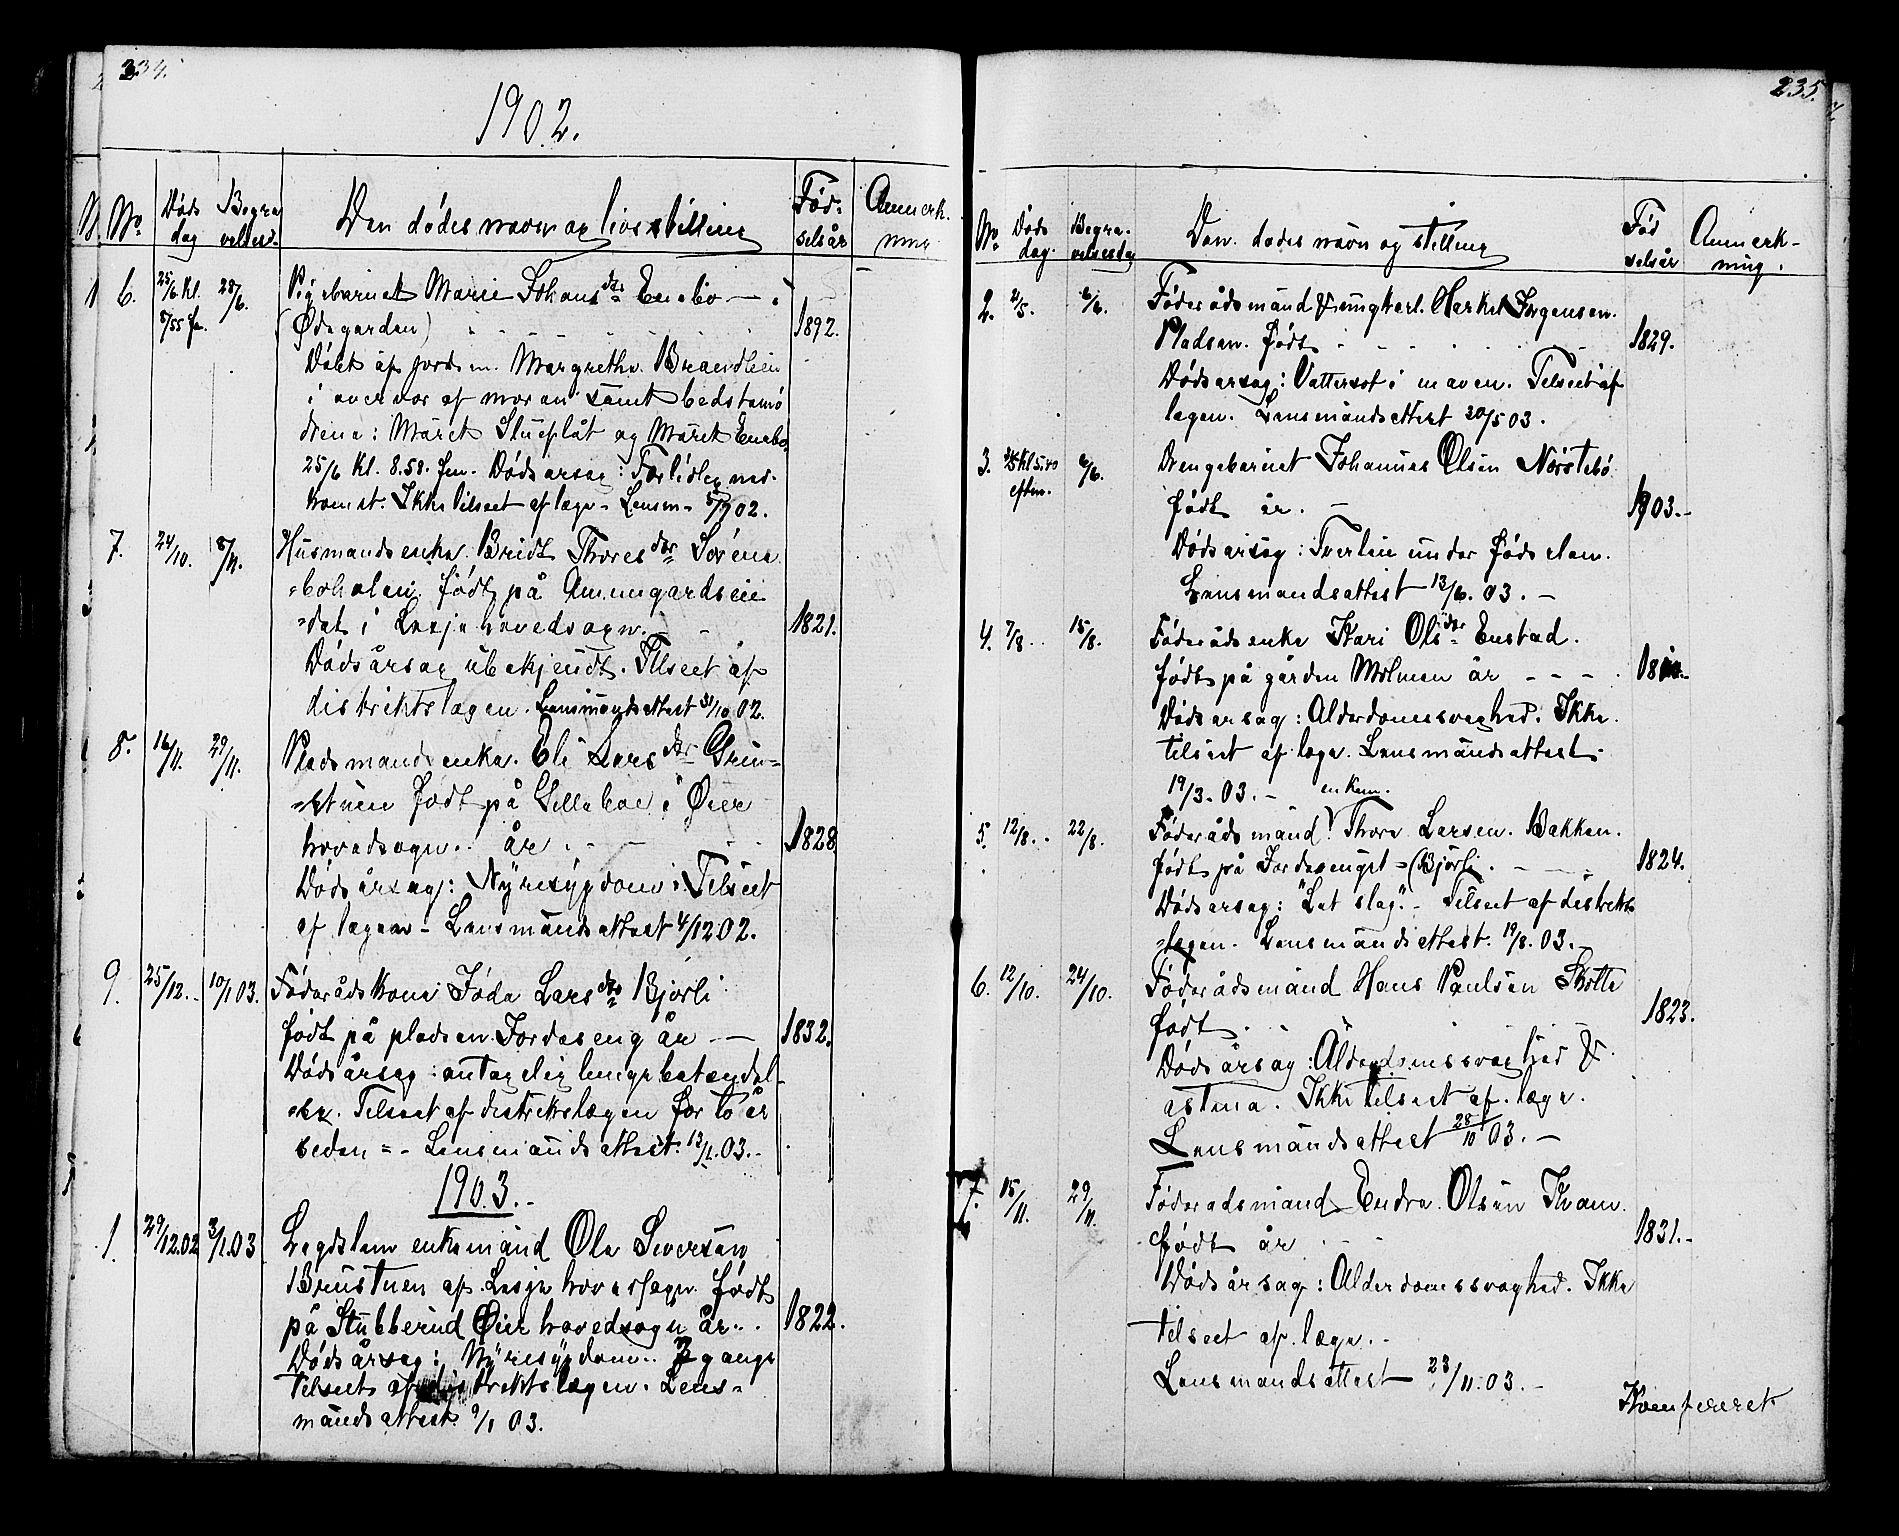 SAH, Lesja prestekontor, Klokkerbok nr. 6, 1871-1904, s. 236-237